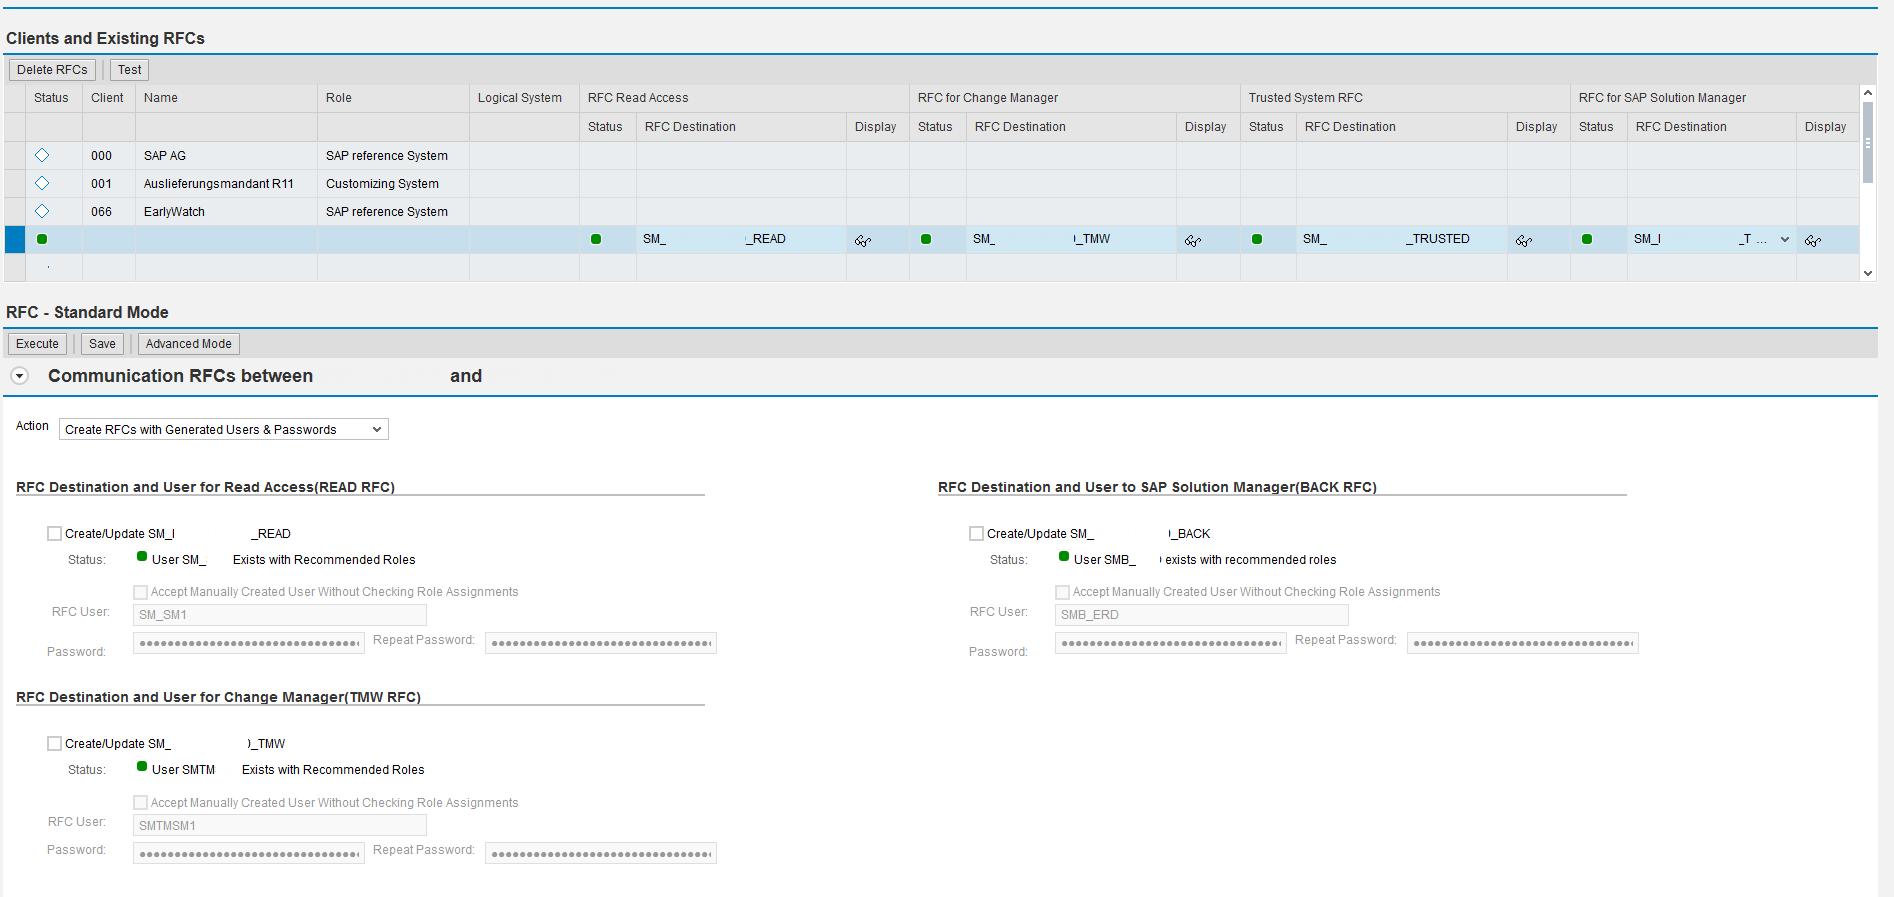 maintenance planner download sap hr support packs sap blogs